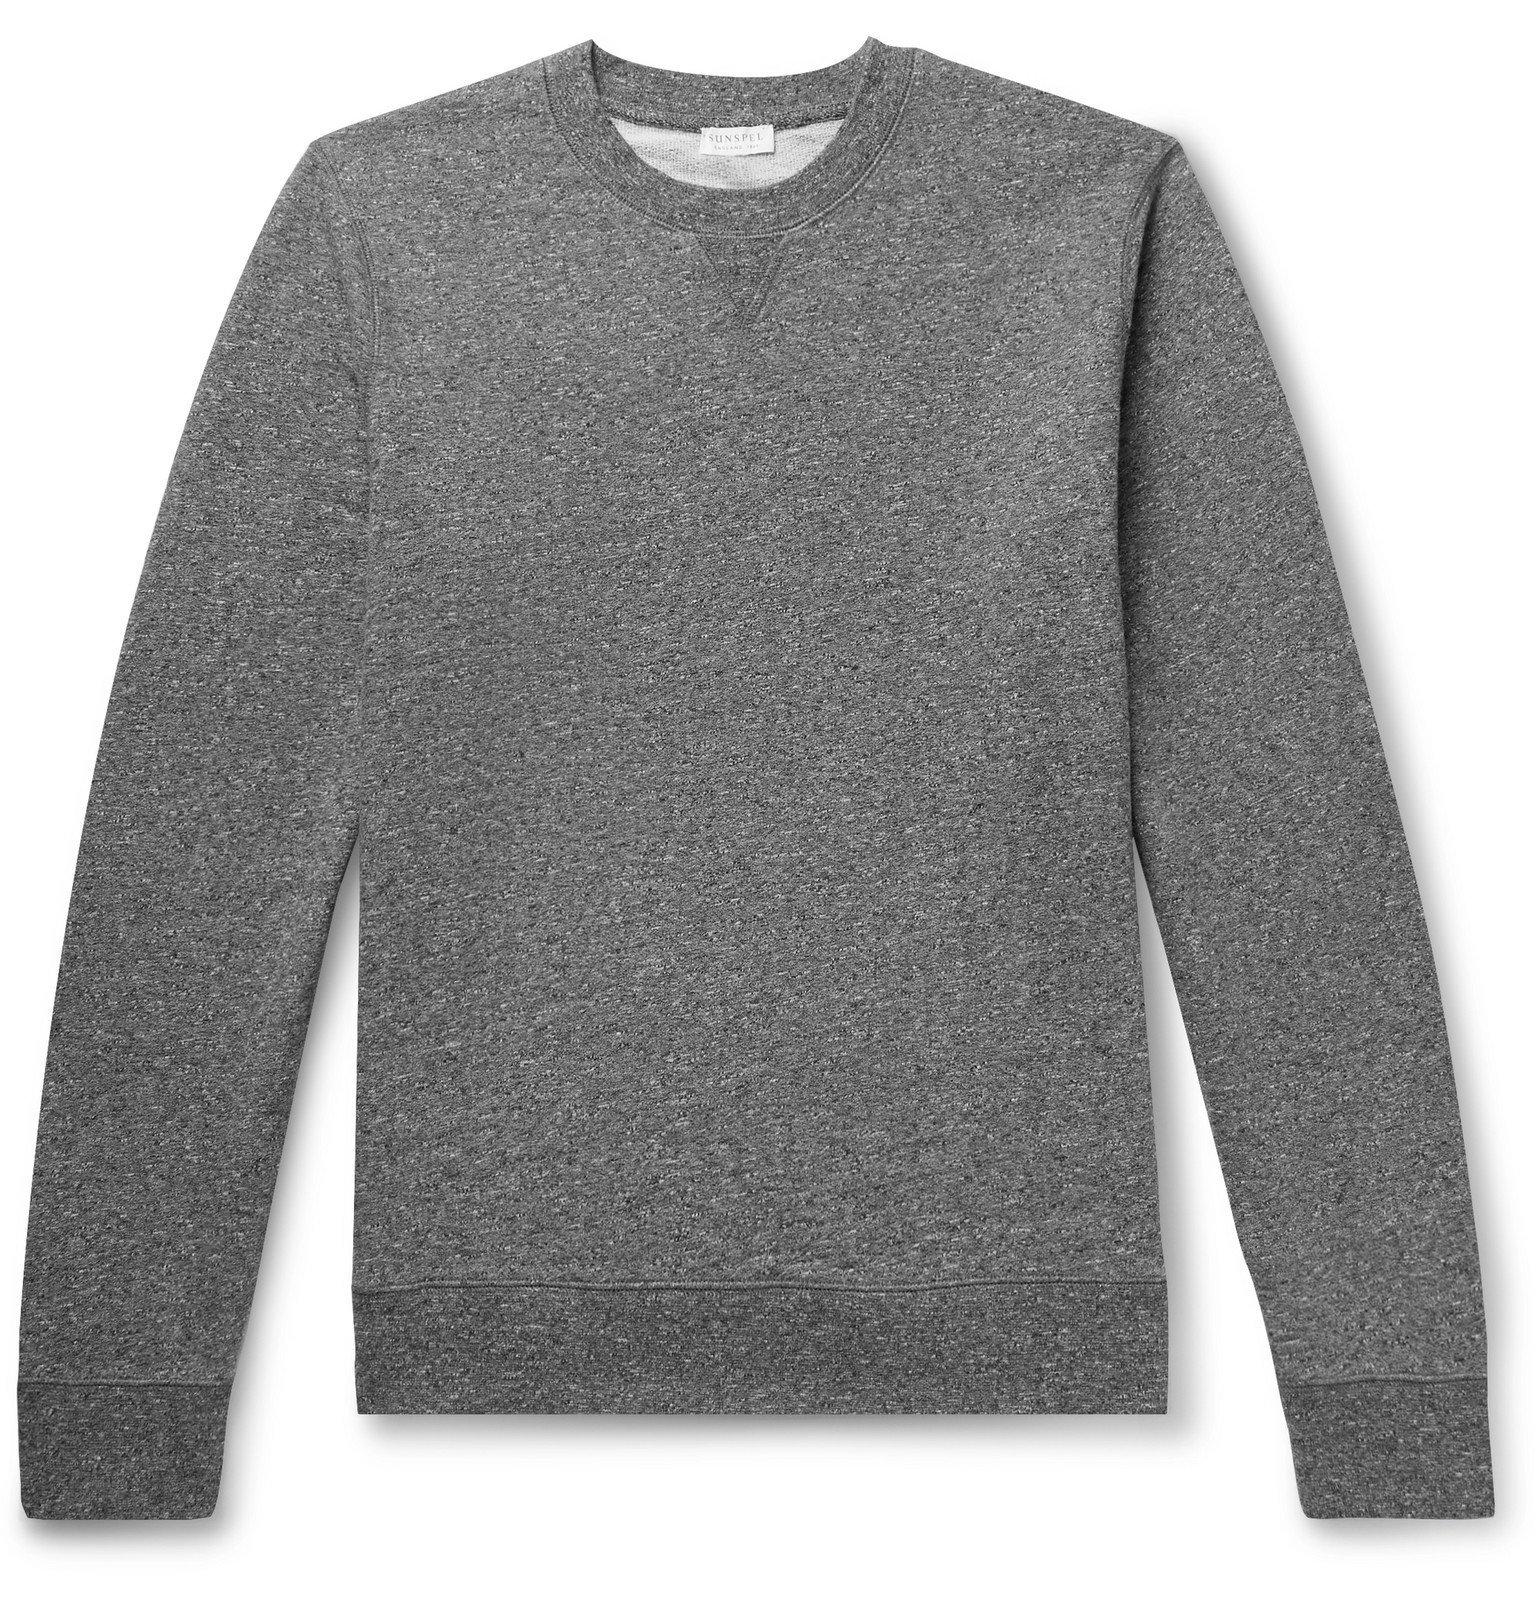 Sunspel - Mélange Loopback Cotton-Jersey Sweatshirt - Gray